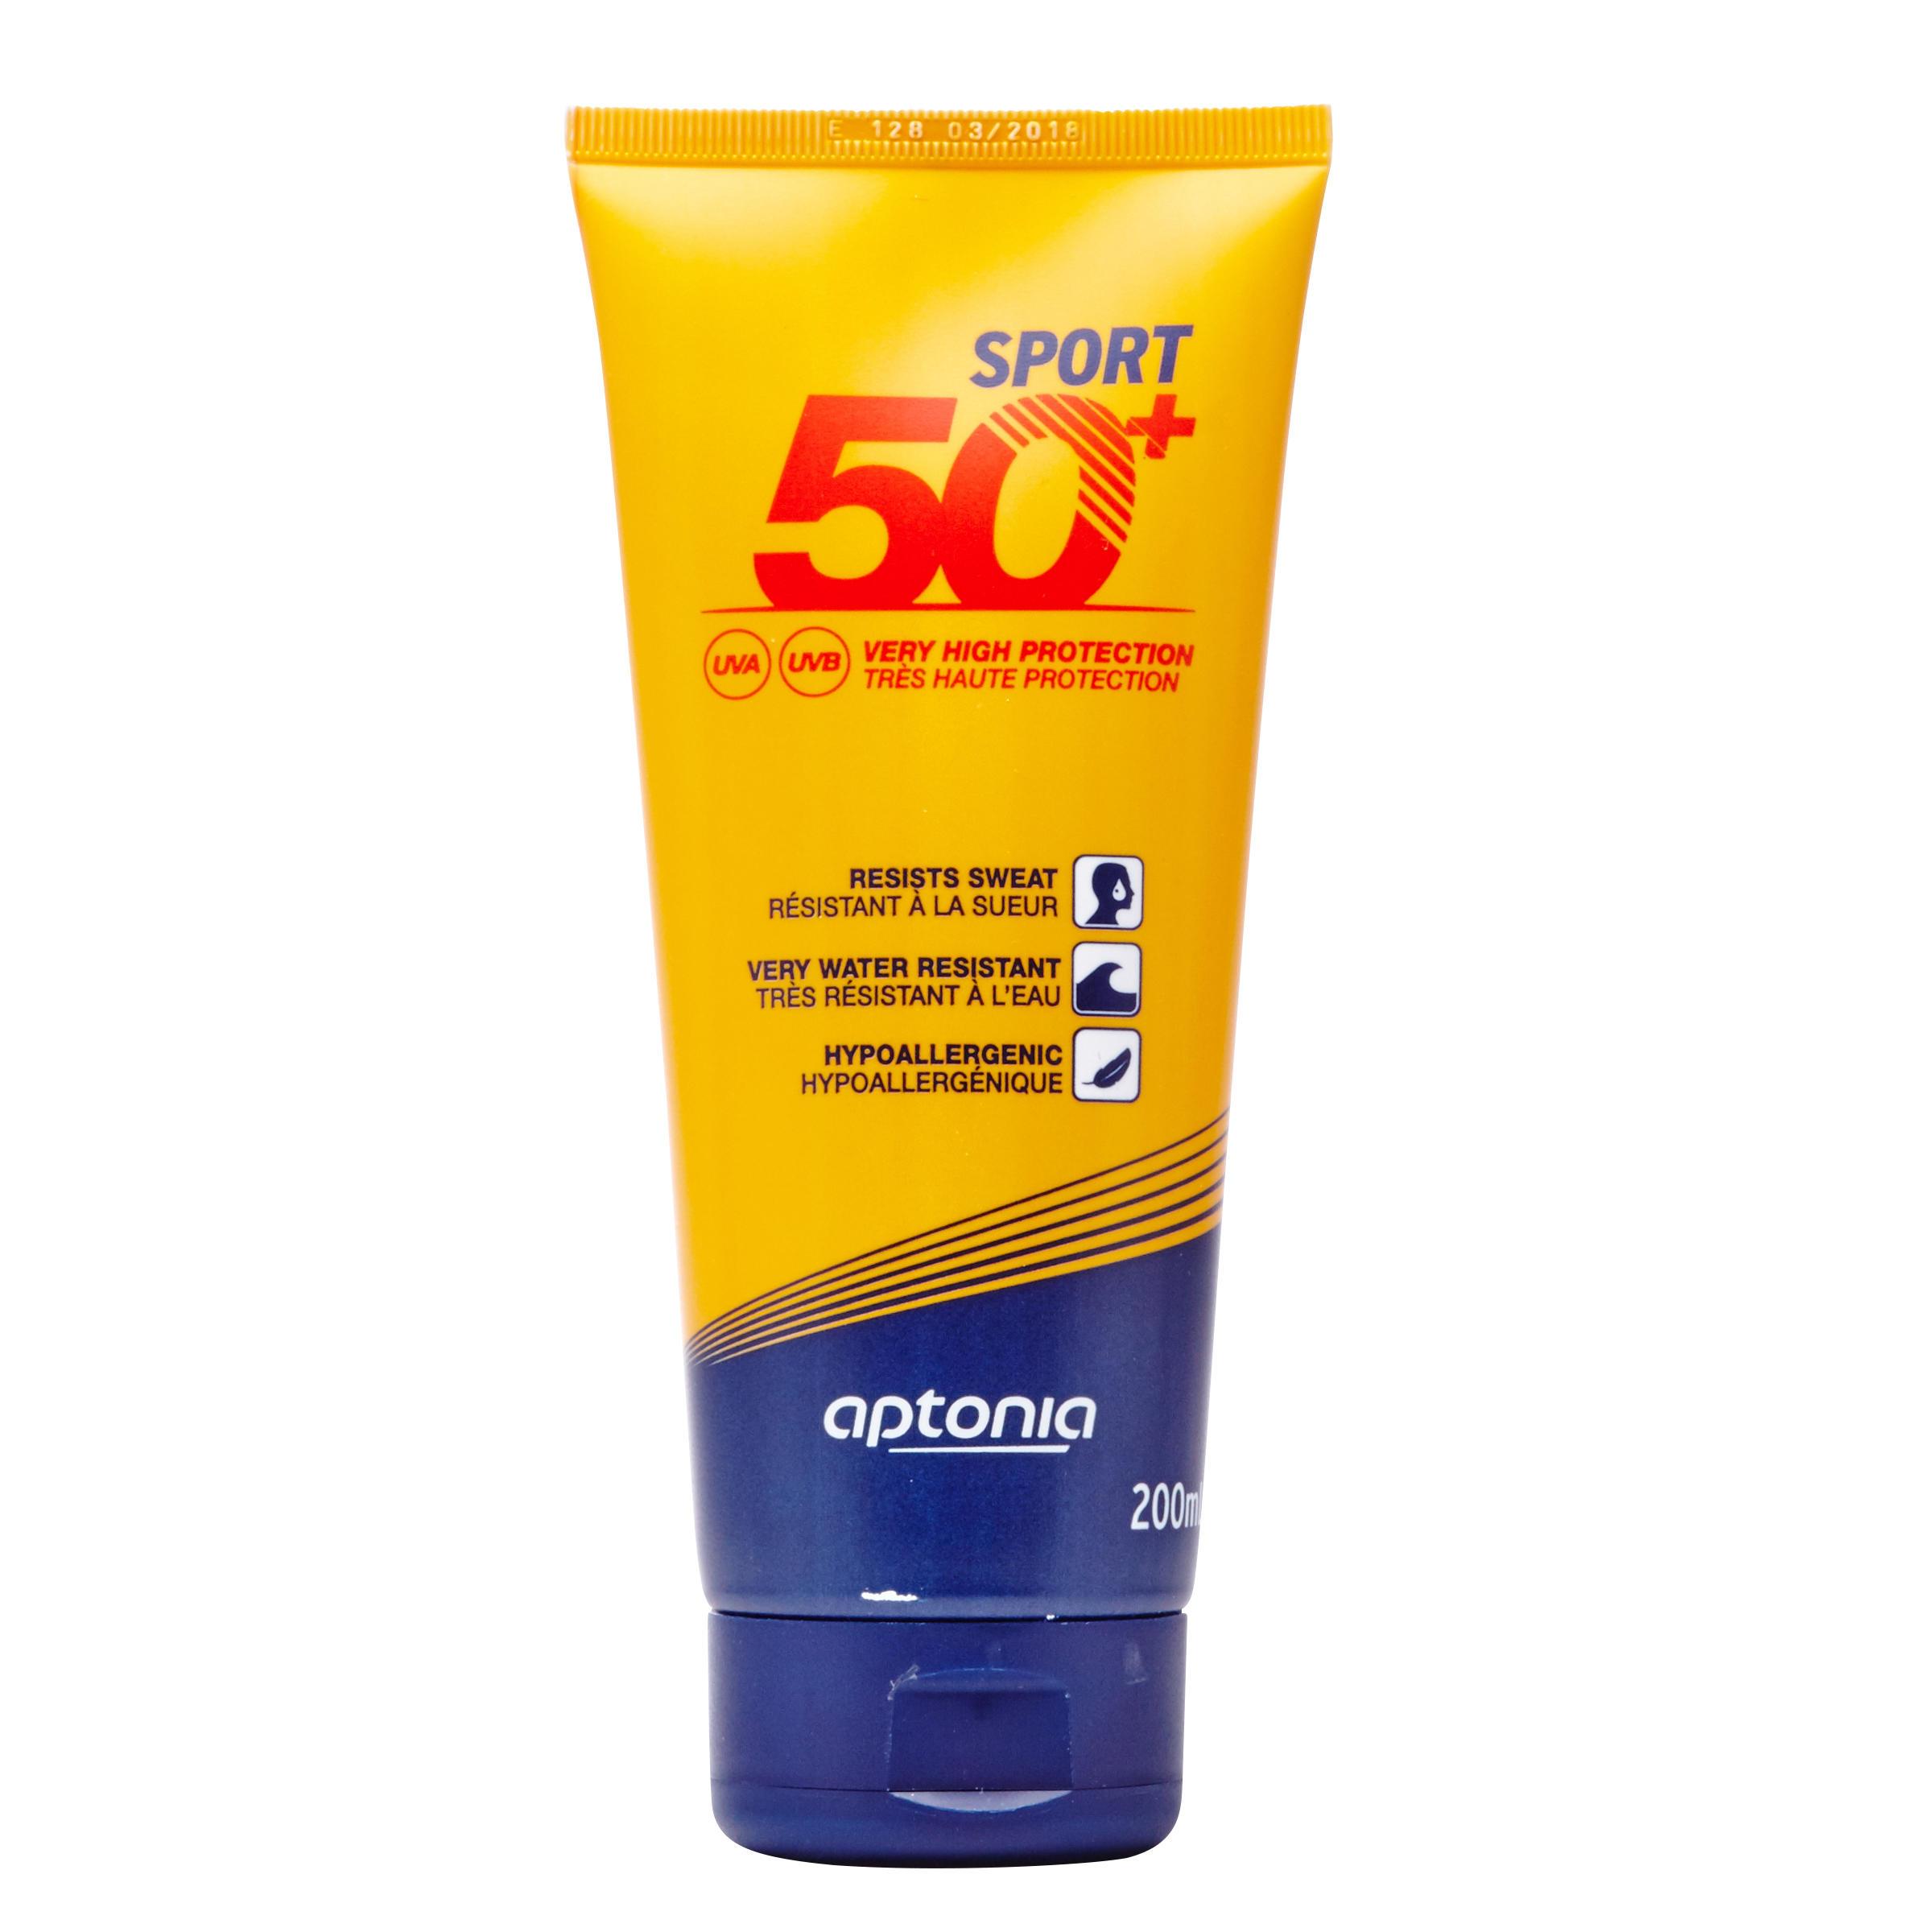 Aptonia Zonnecrème voor sporters factor 50+ 200 ml thumbnail